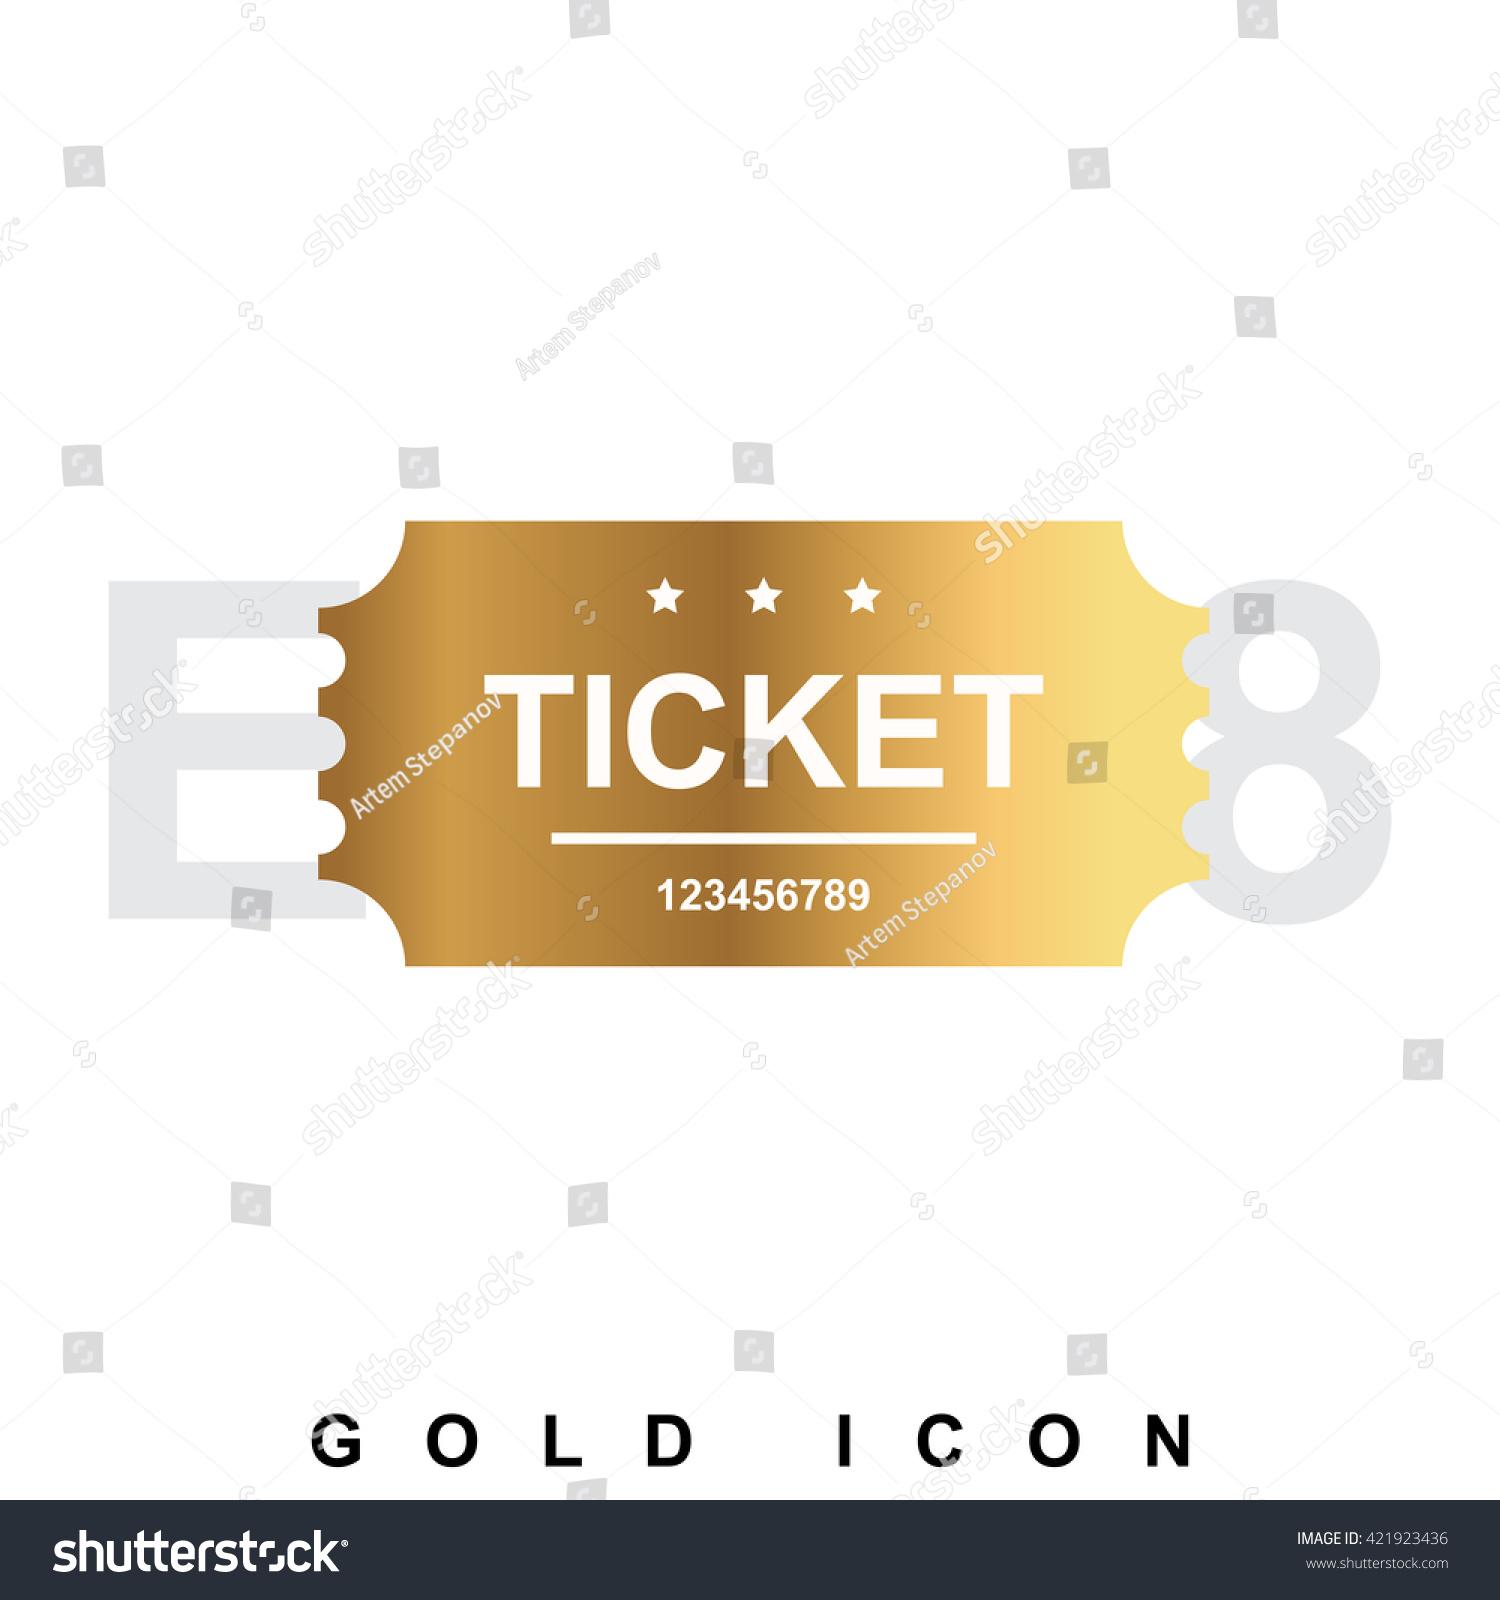 Großartig Druckbare Goldene Ticketvorlage Ideen - Entry Level Resume ...